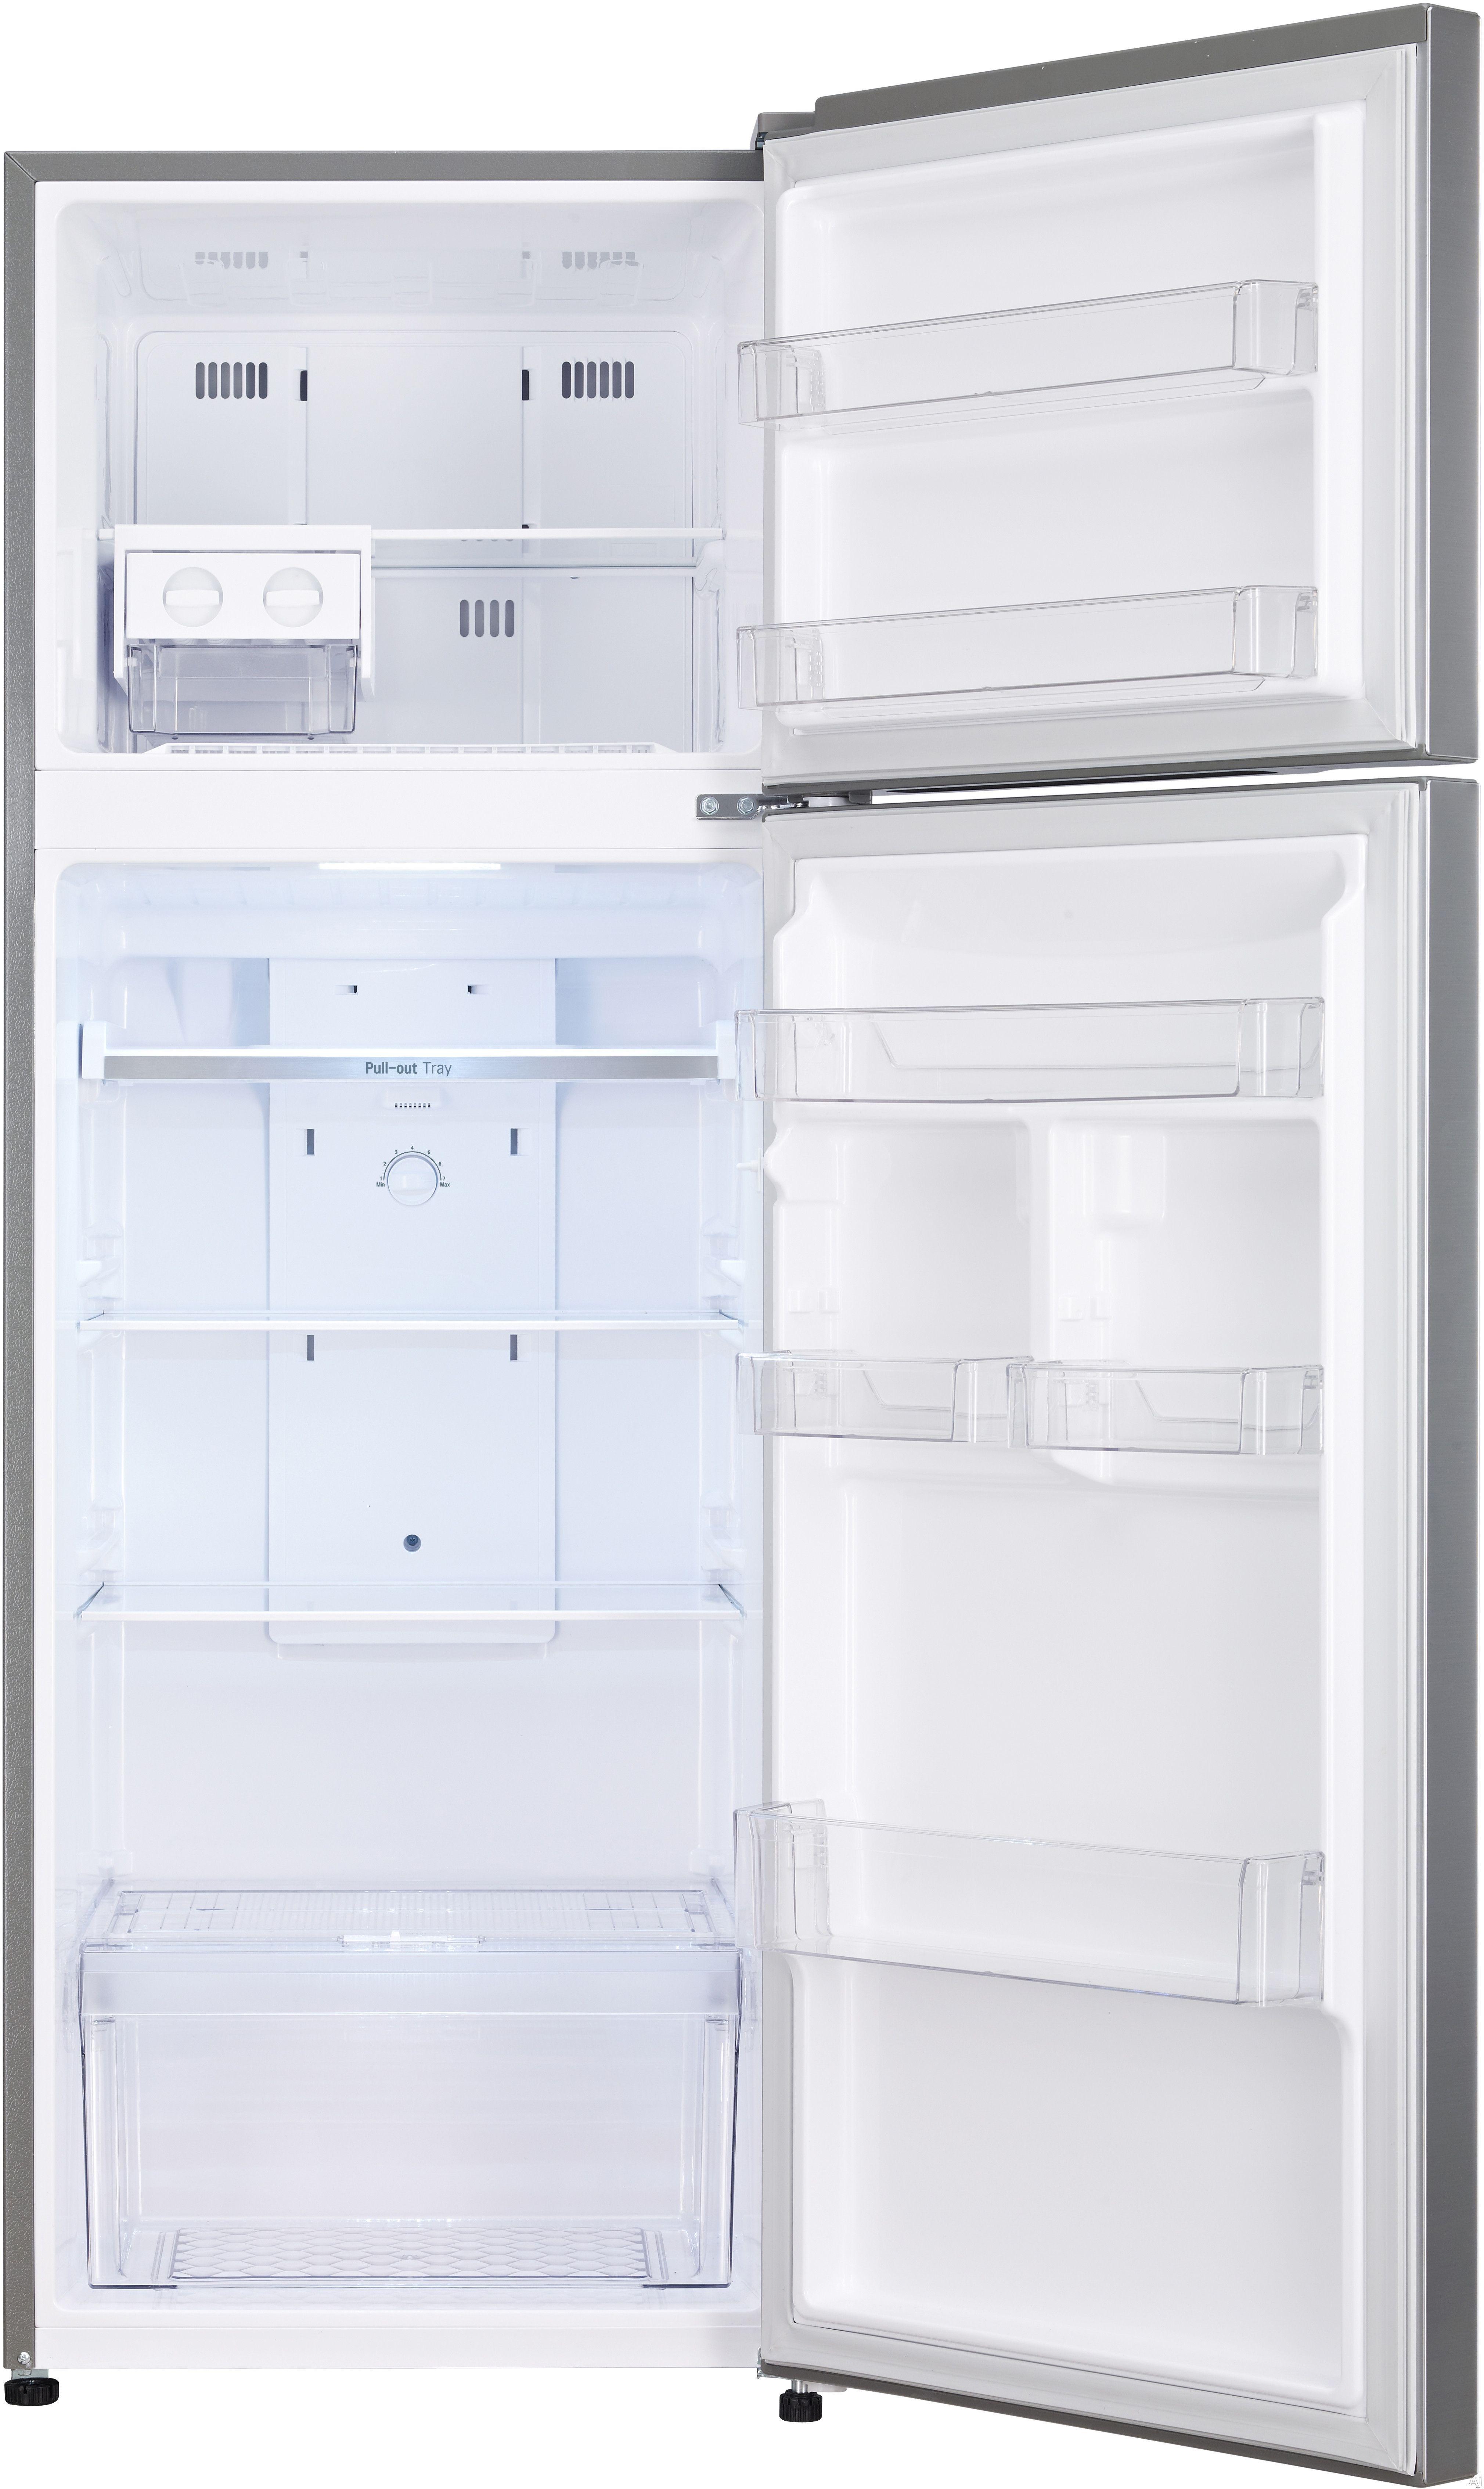 Top Freezer Refrigerator With 3 Spill Proof Shelves 4 Door Bins Smartdiagnosis Lodecibel Quiet Operation Auto Closing Hinge And 2017 Doe Compliant